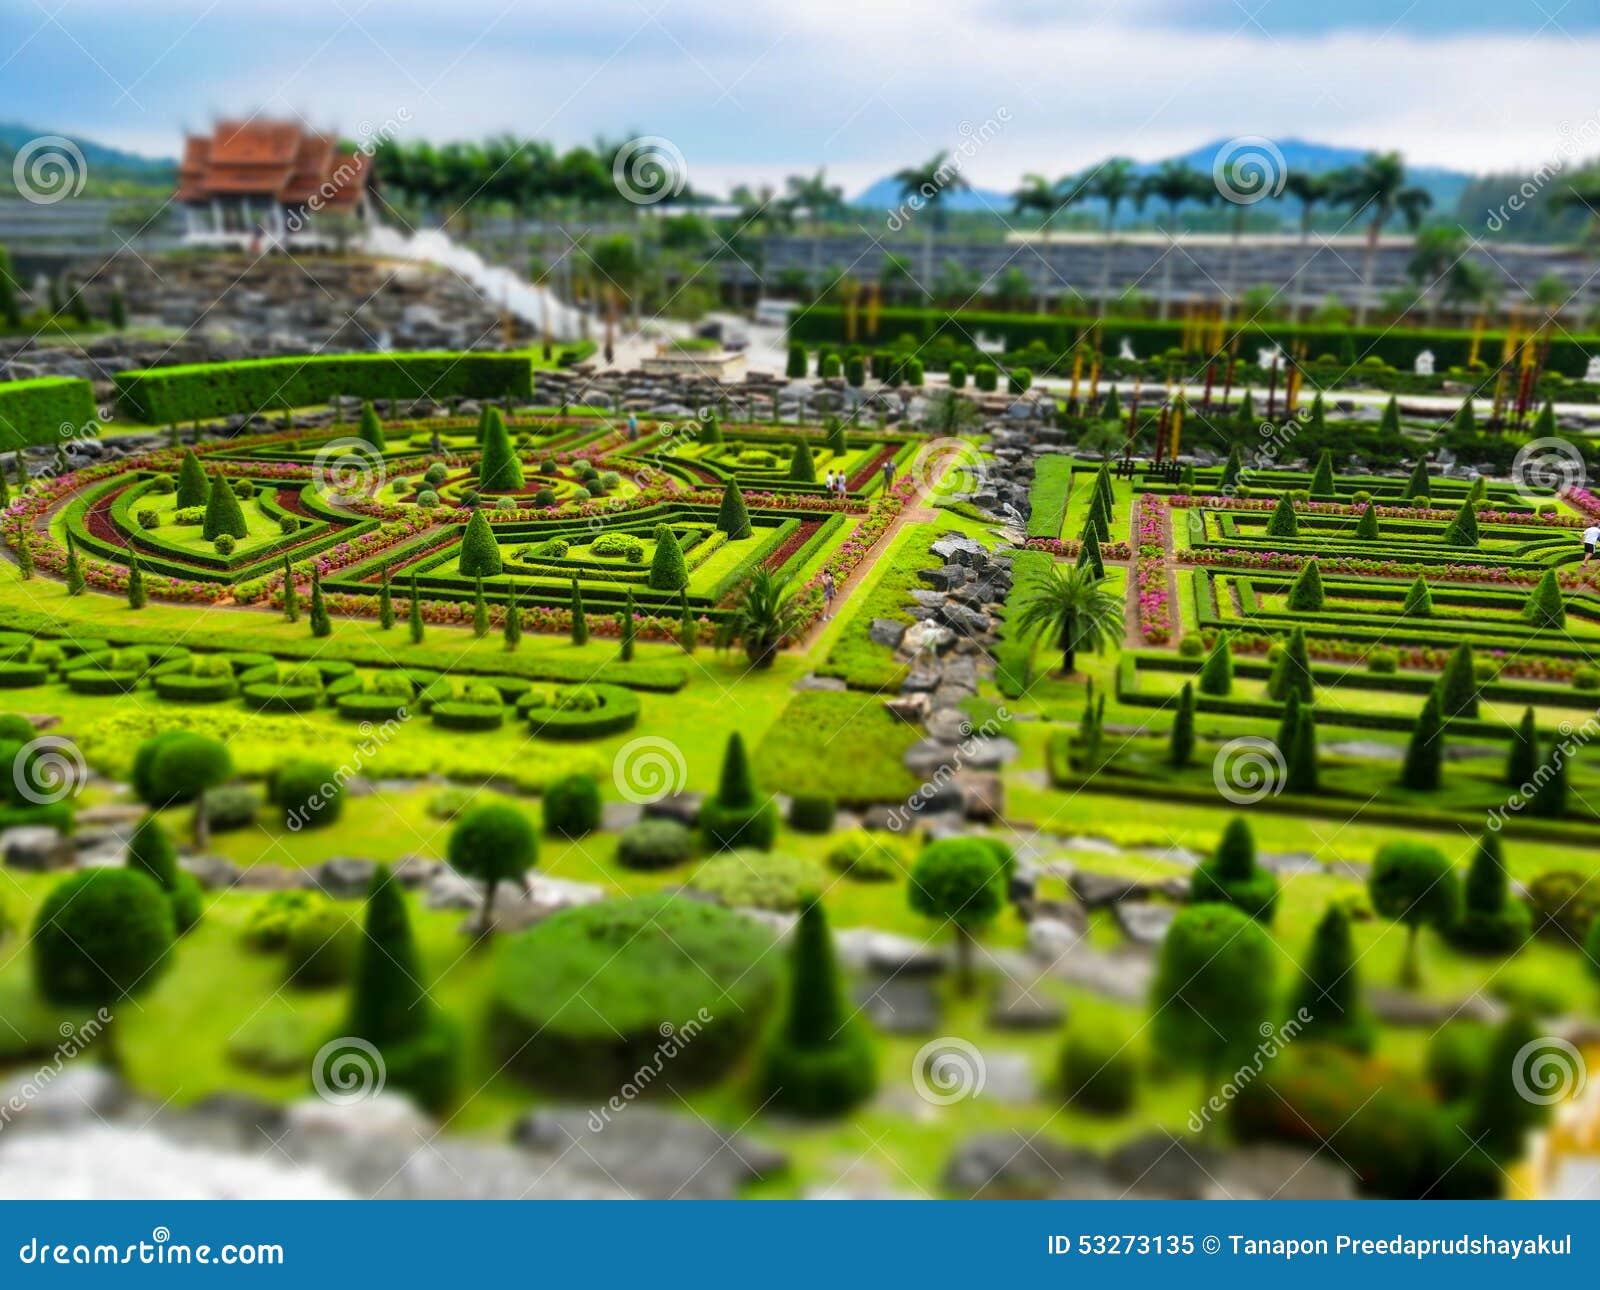 Toy city Nong Nooch Garden in Pattaya, Thailand